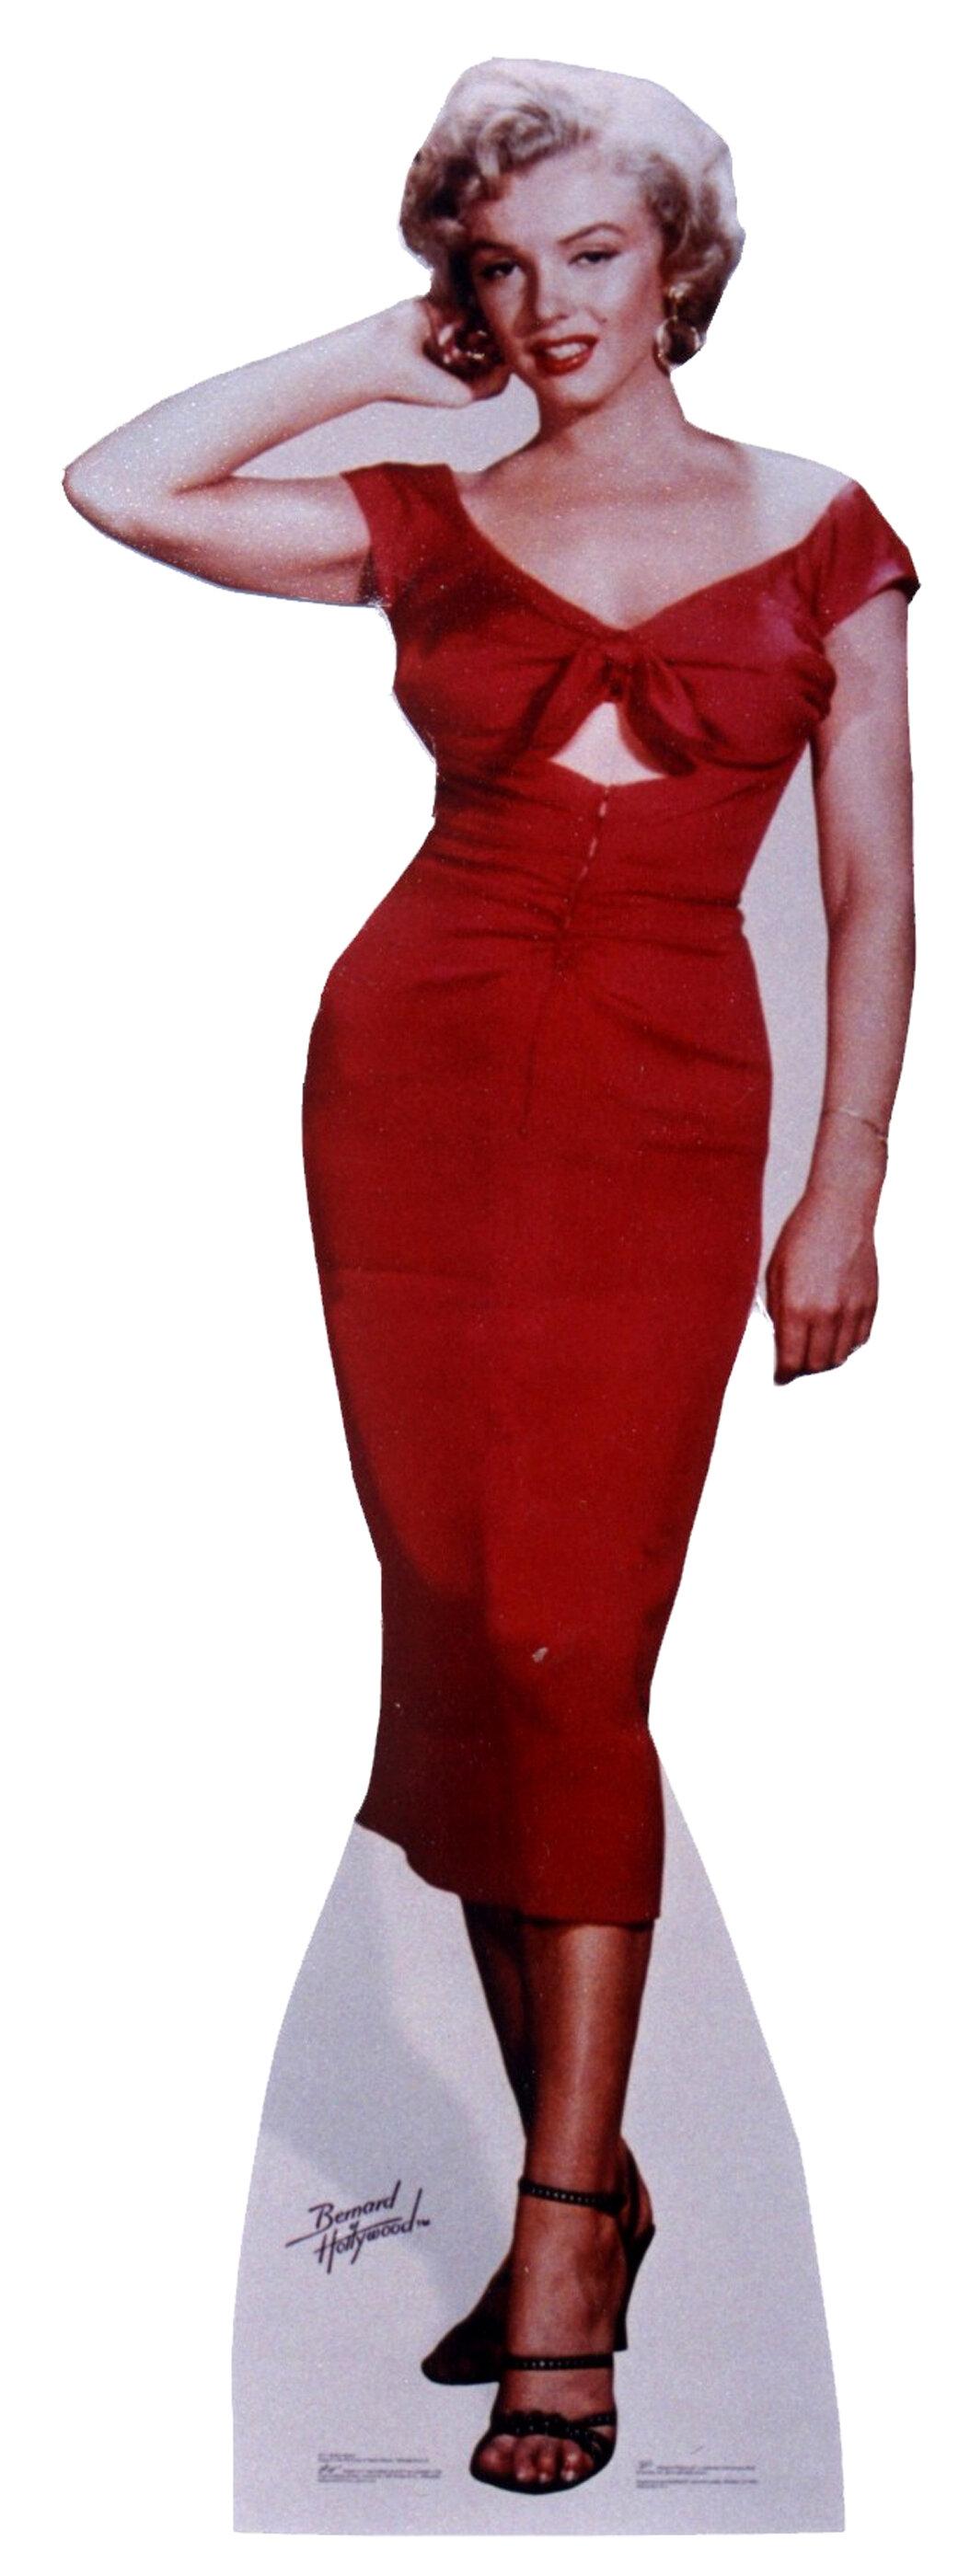 70c5f55dd48bd Advanced Graphics Marilyn Monroe Niagara Cardboard Standup